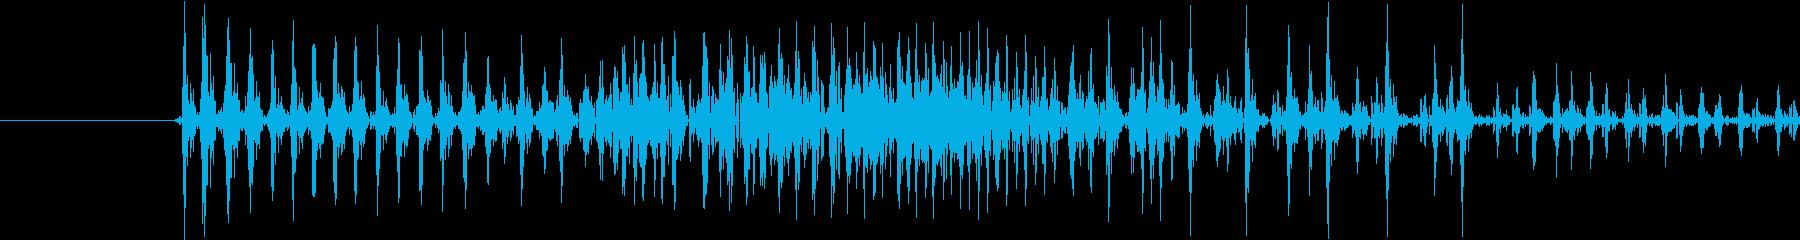 MEDIUM KISSキスの再生済みの波形